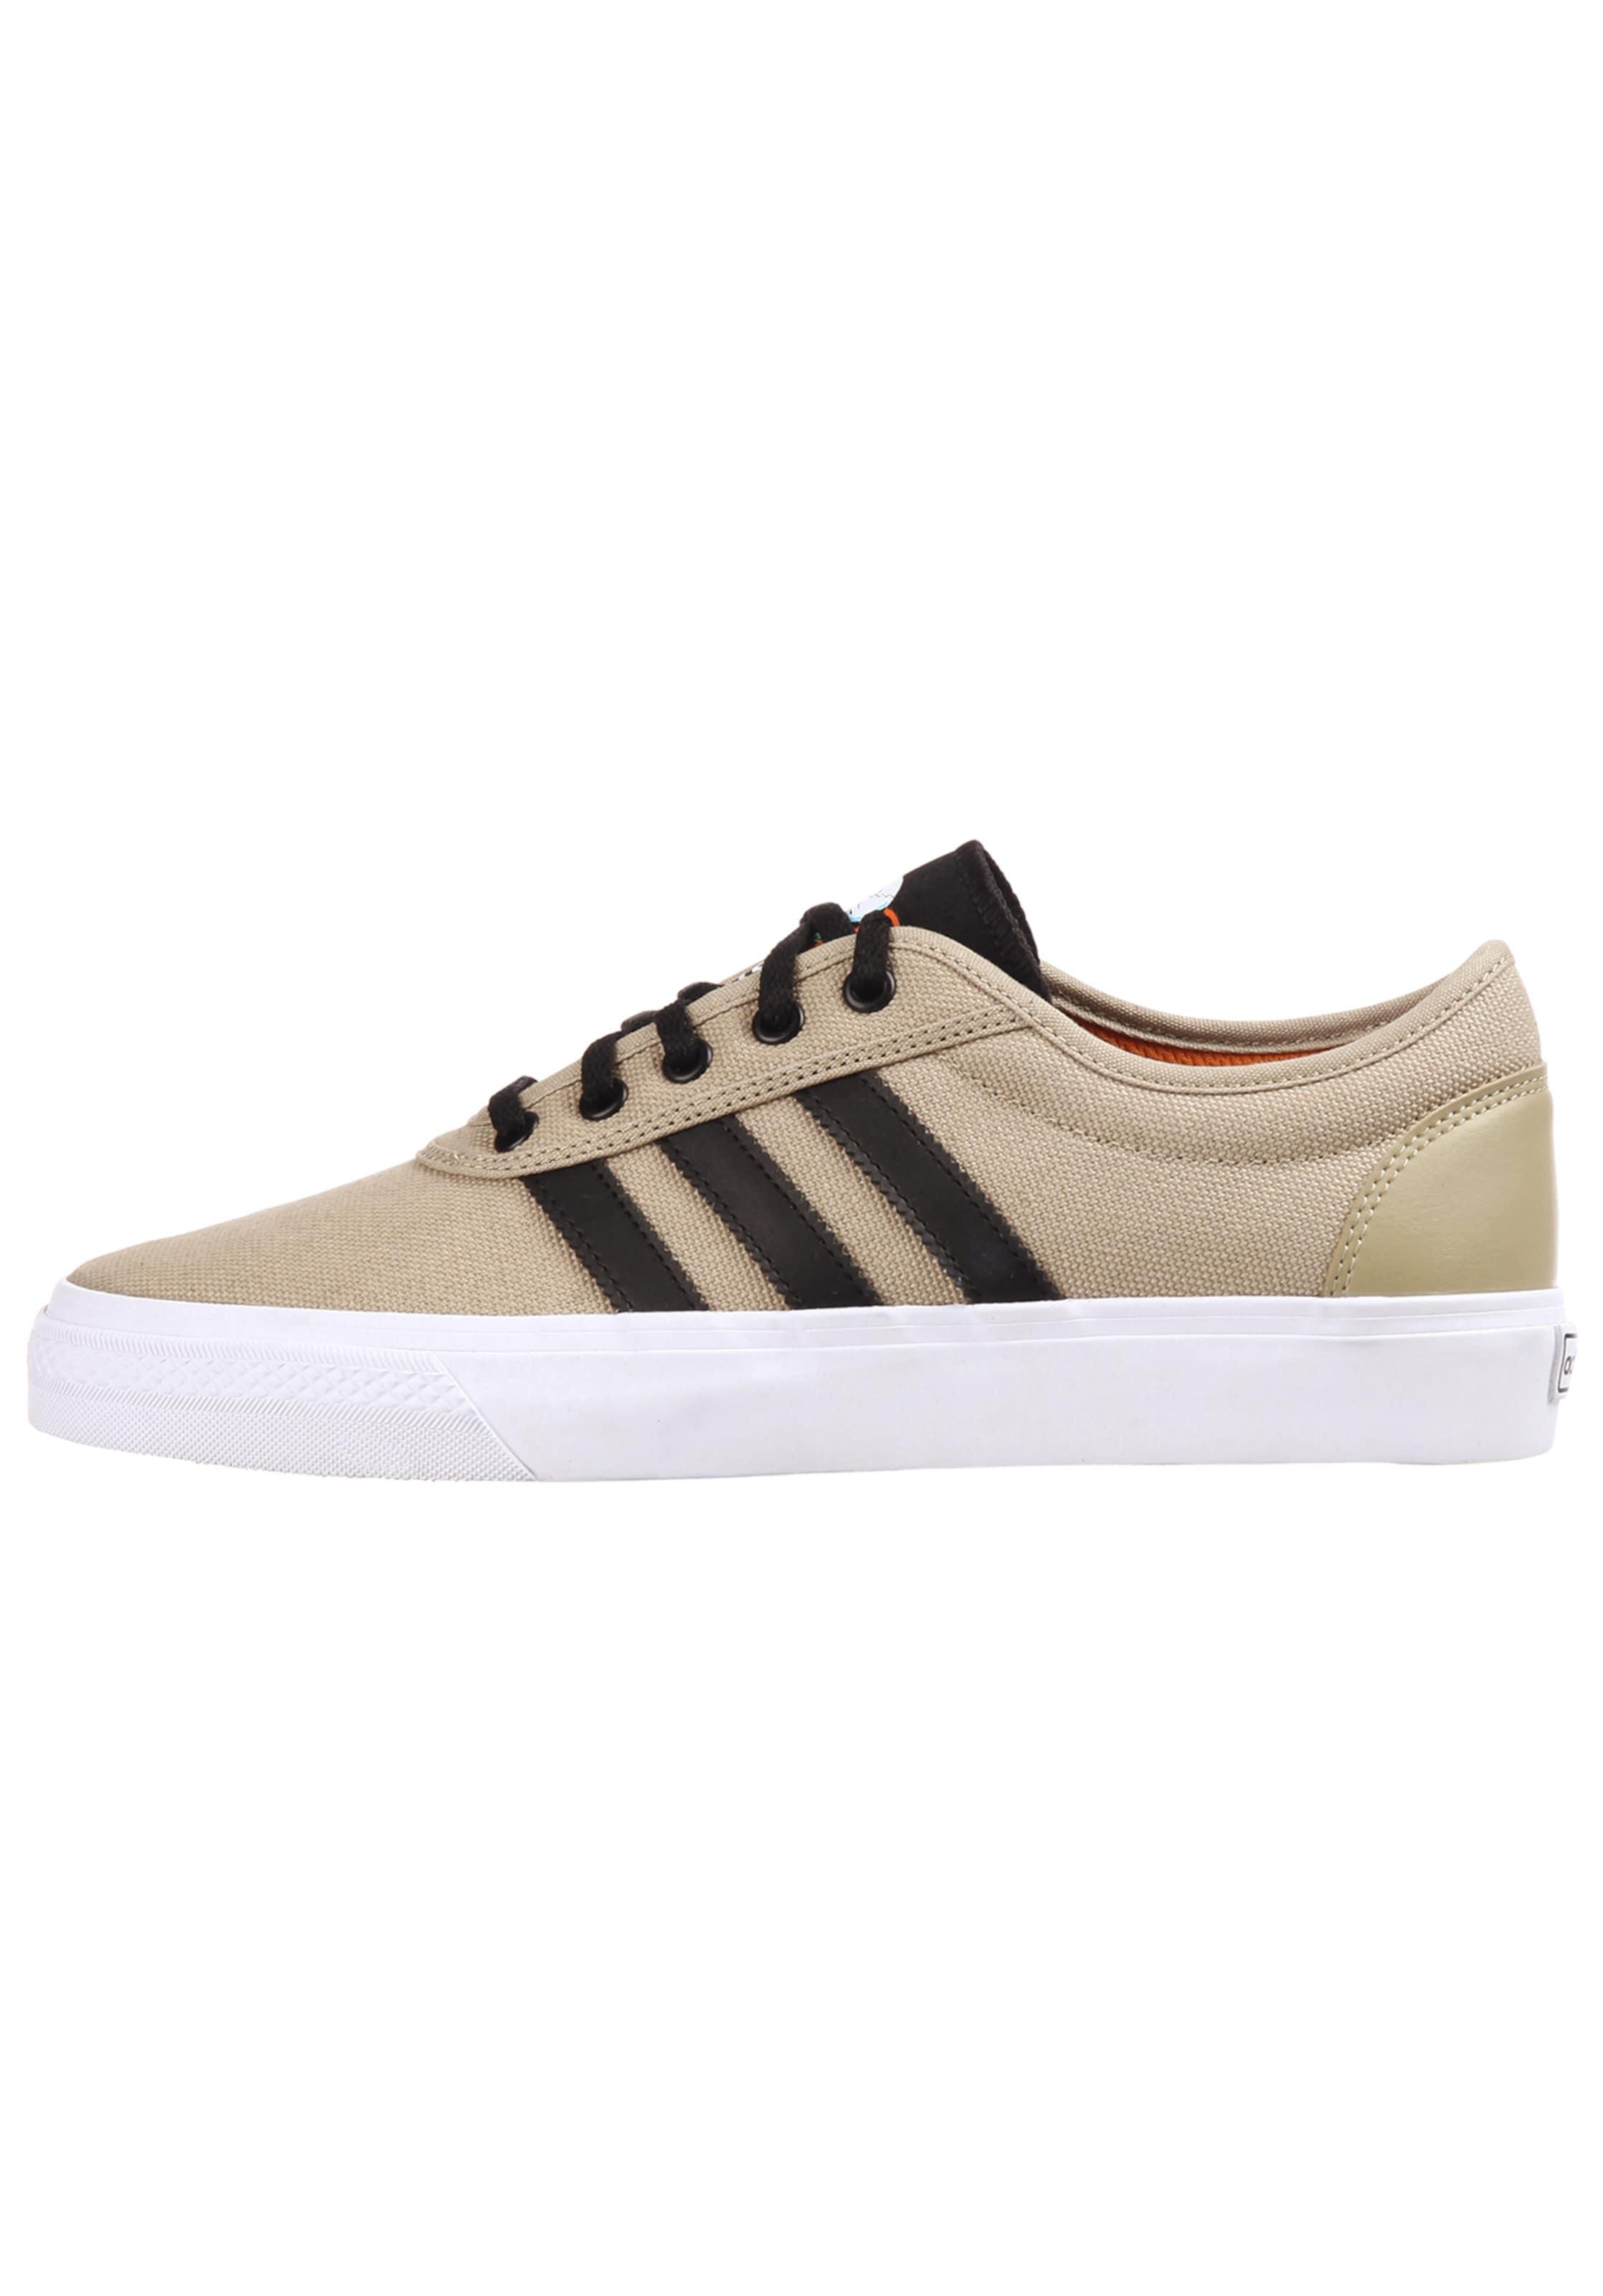 ADIDAS ORIGINALS Adi-Ease Sneaker Verschleißfeste billige Schuhe